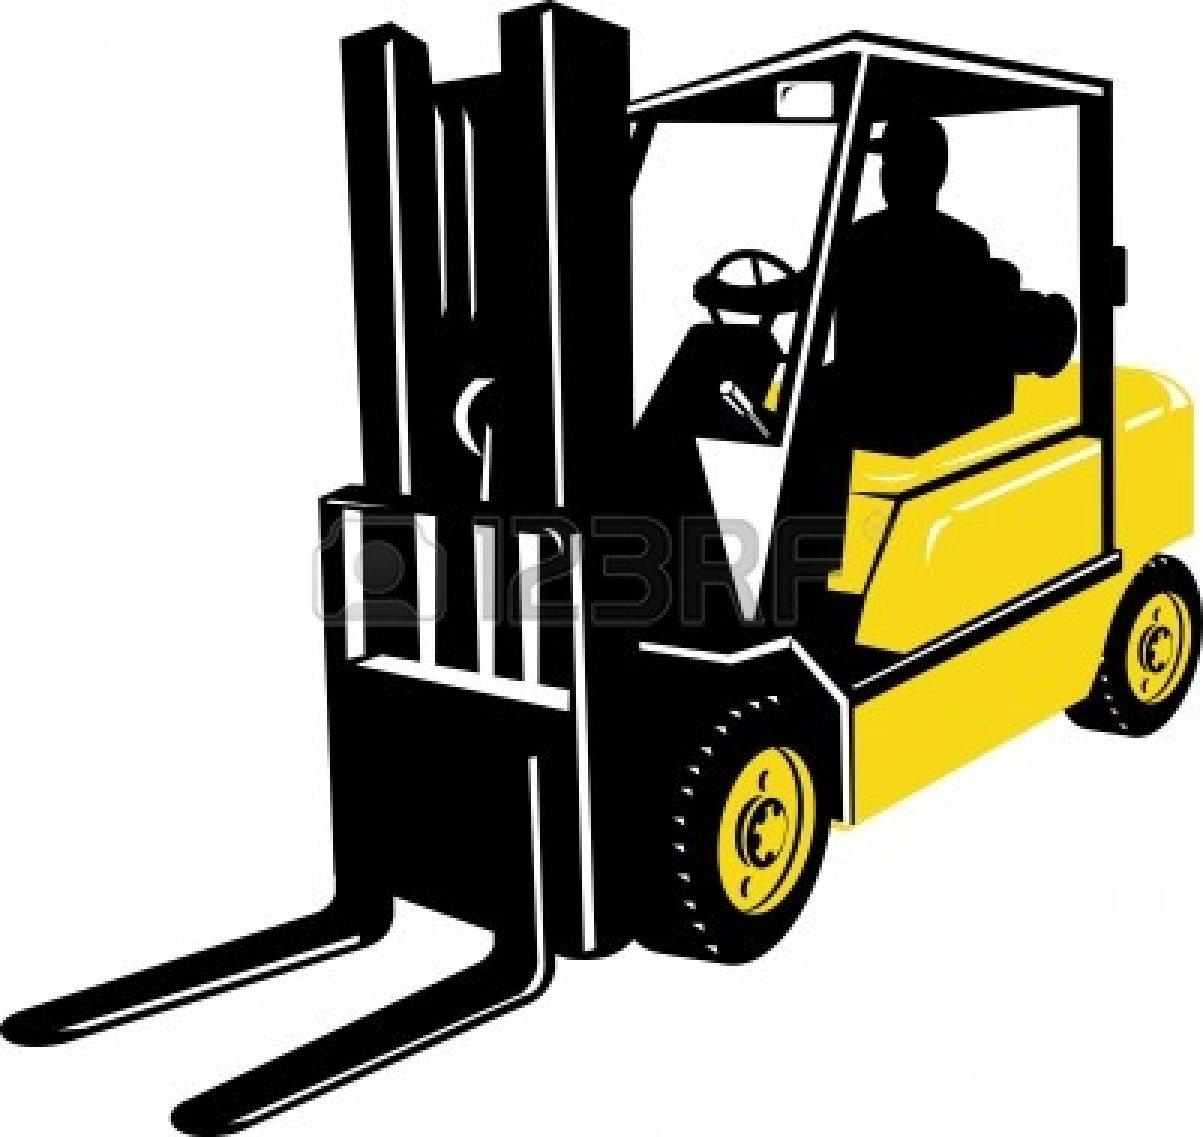 1203x1137 Lift Truck Clipart